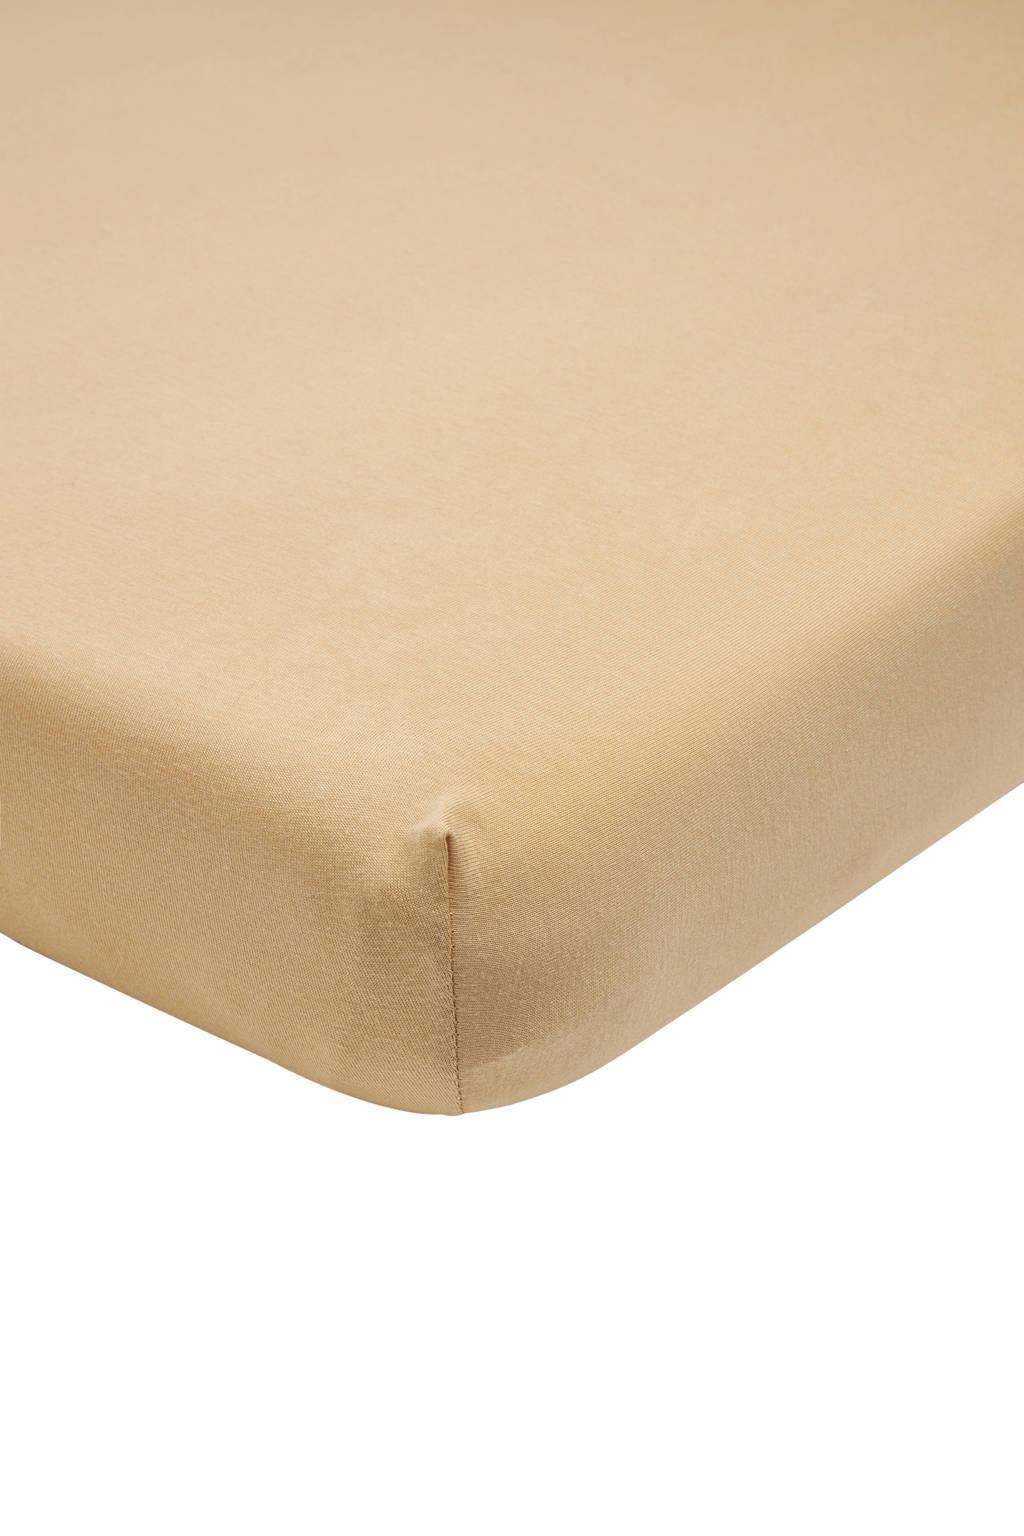 Meyco katoenen jersey hoeslaken peuter 70x140/150 cm warm sand Zand